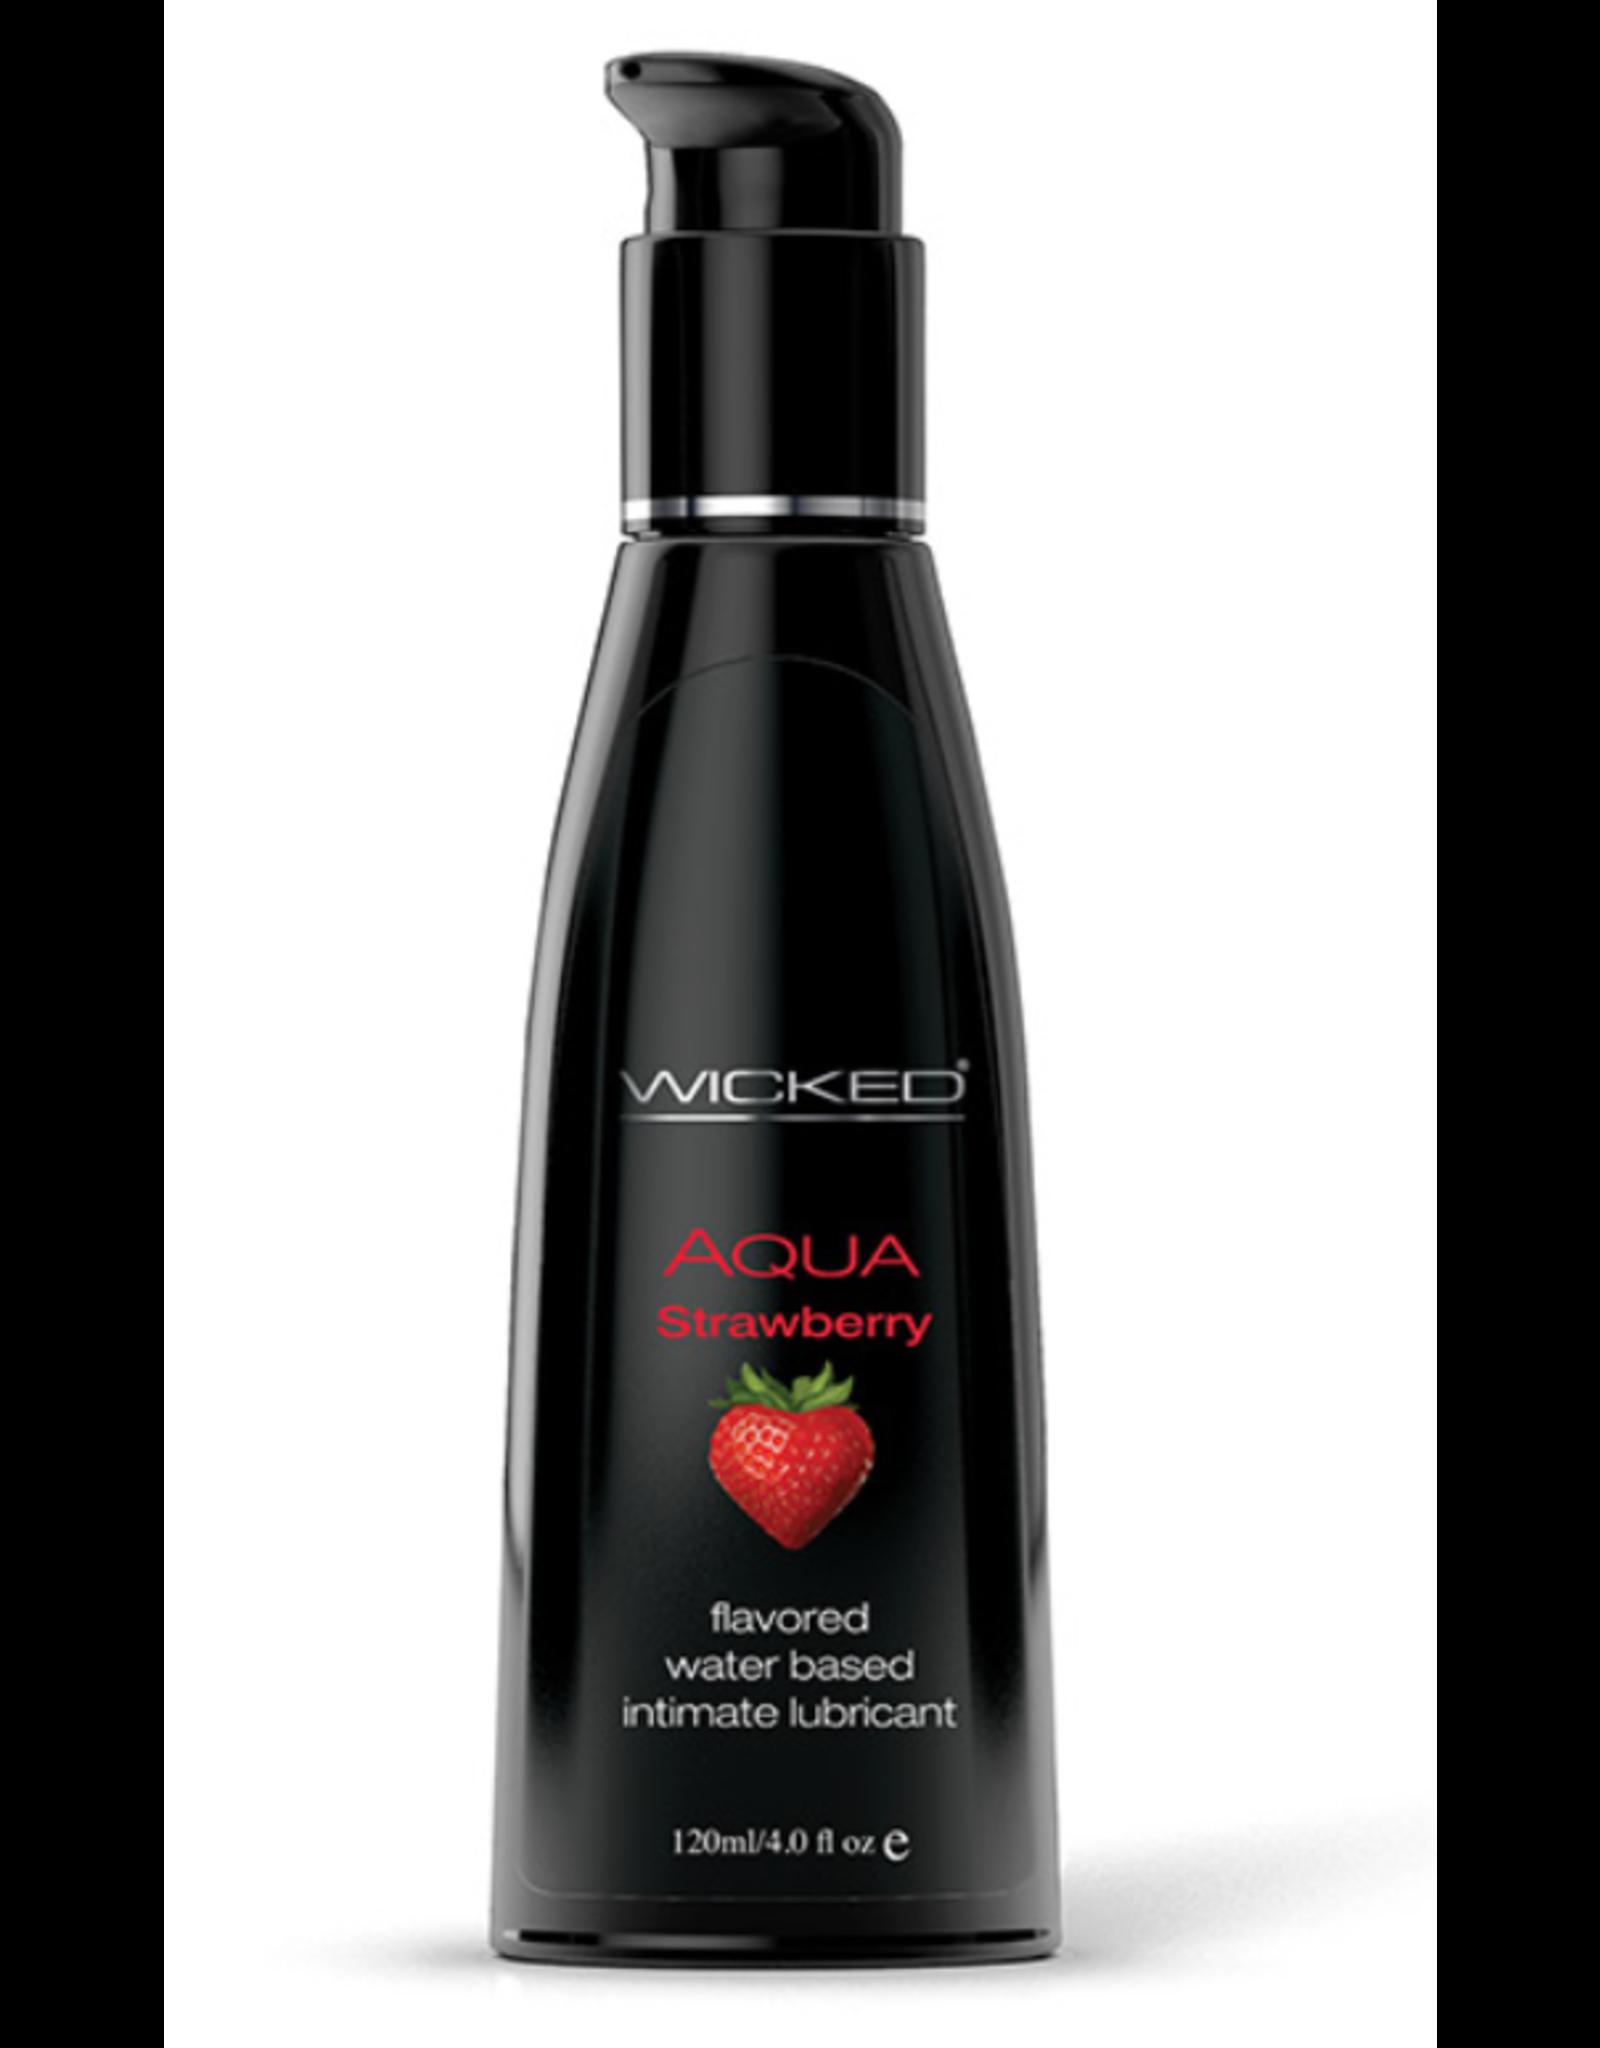 Wicked Sensual Care Aqua Water Based Lubricant - 4 oz Strawberry